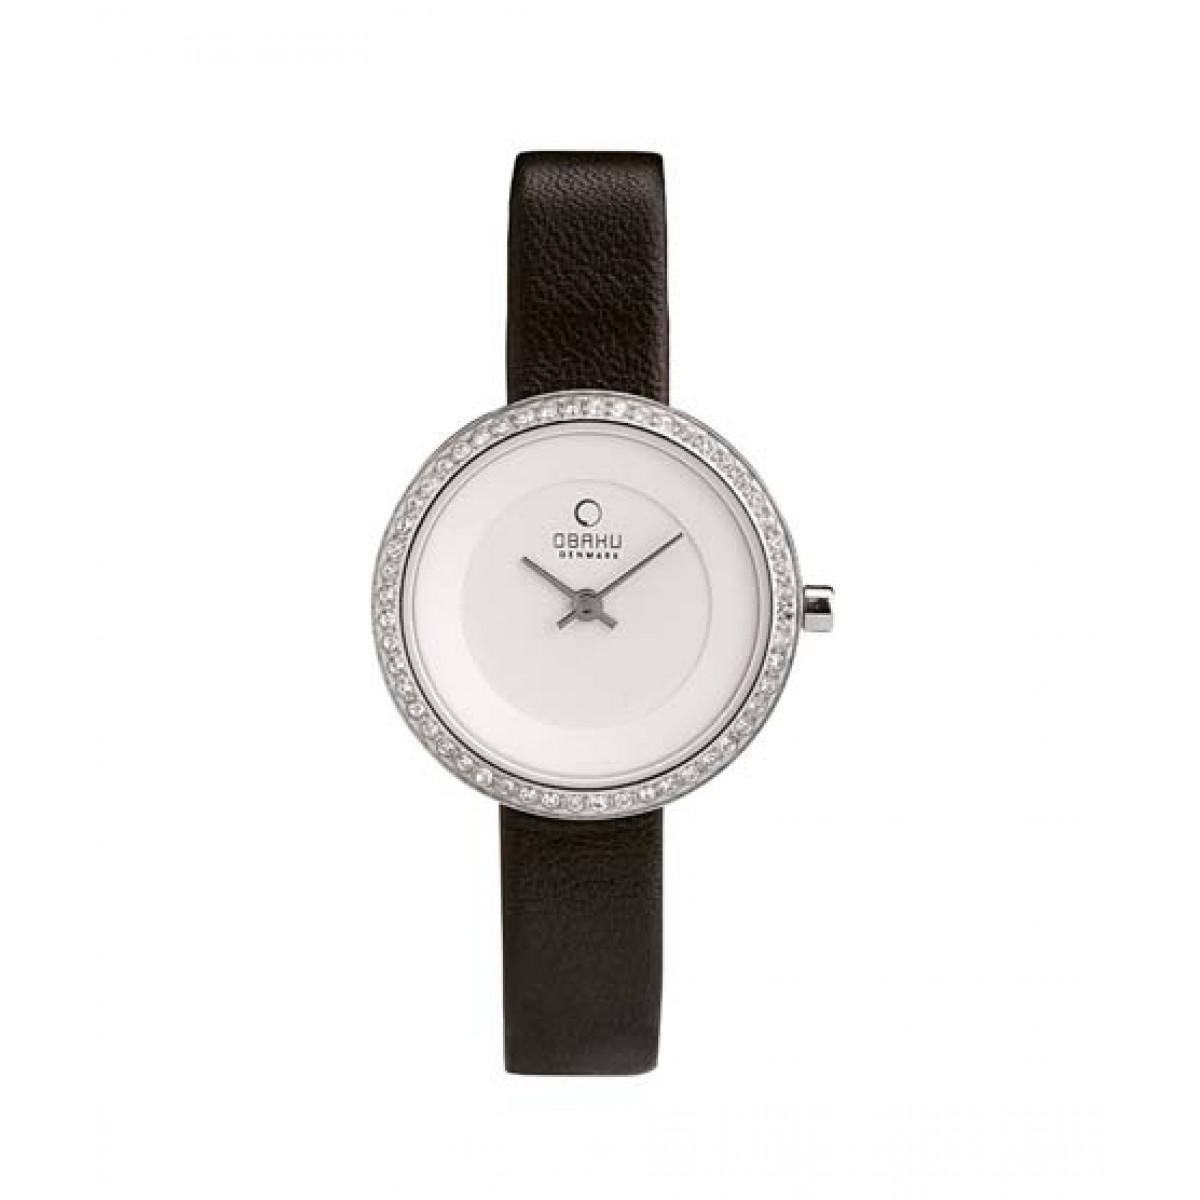 Obaku Quartz Women's Watch Black (V146LECIRB)